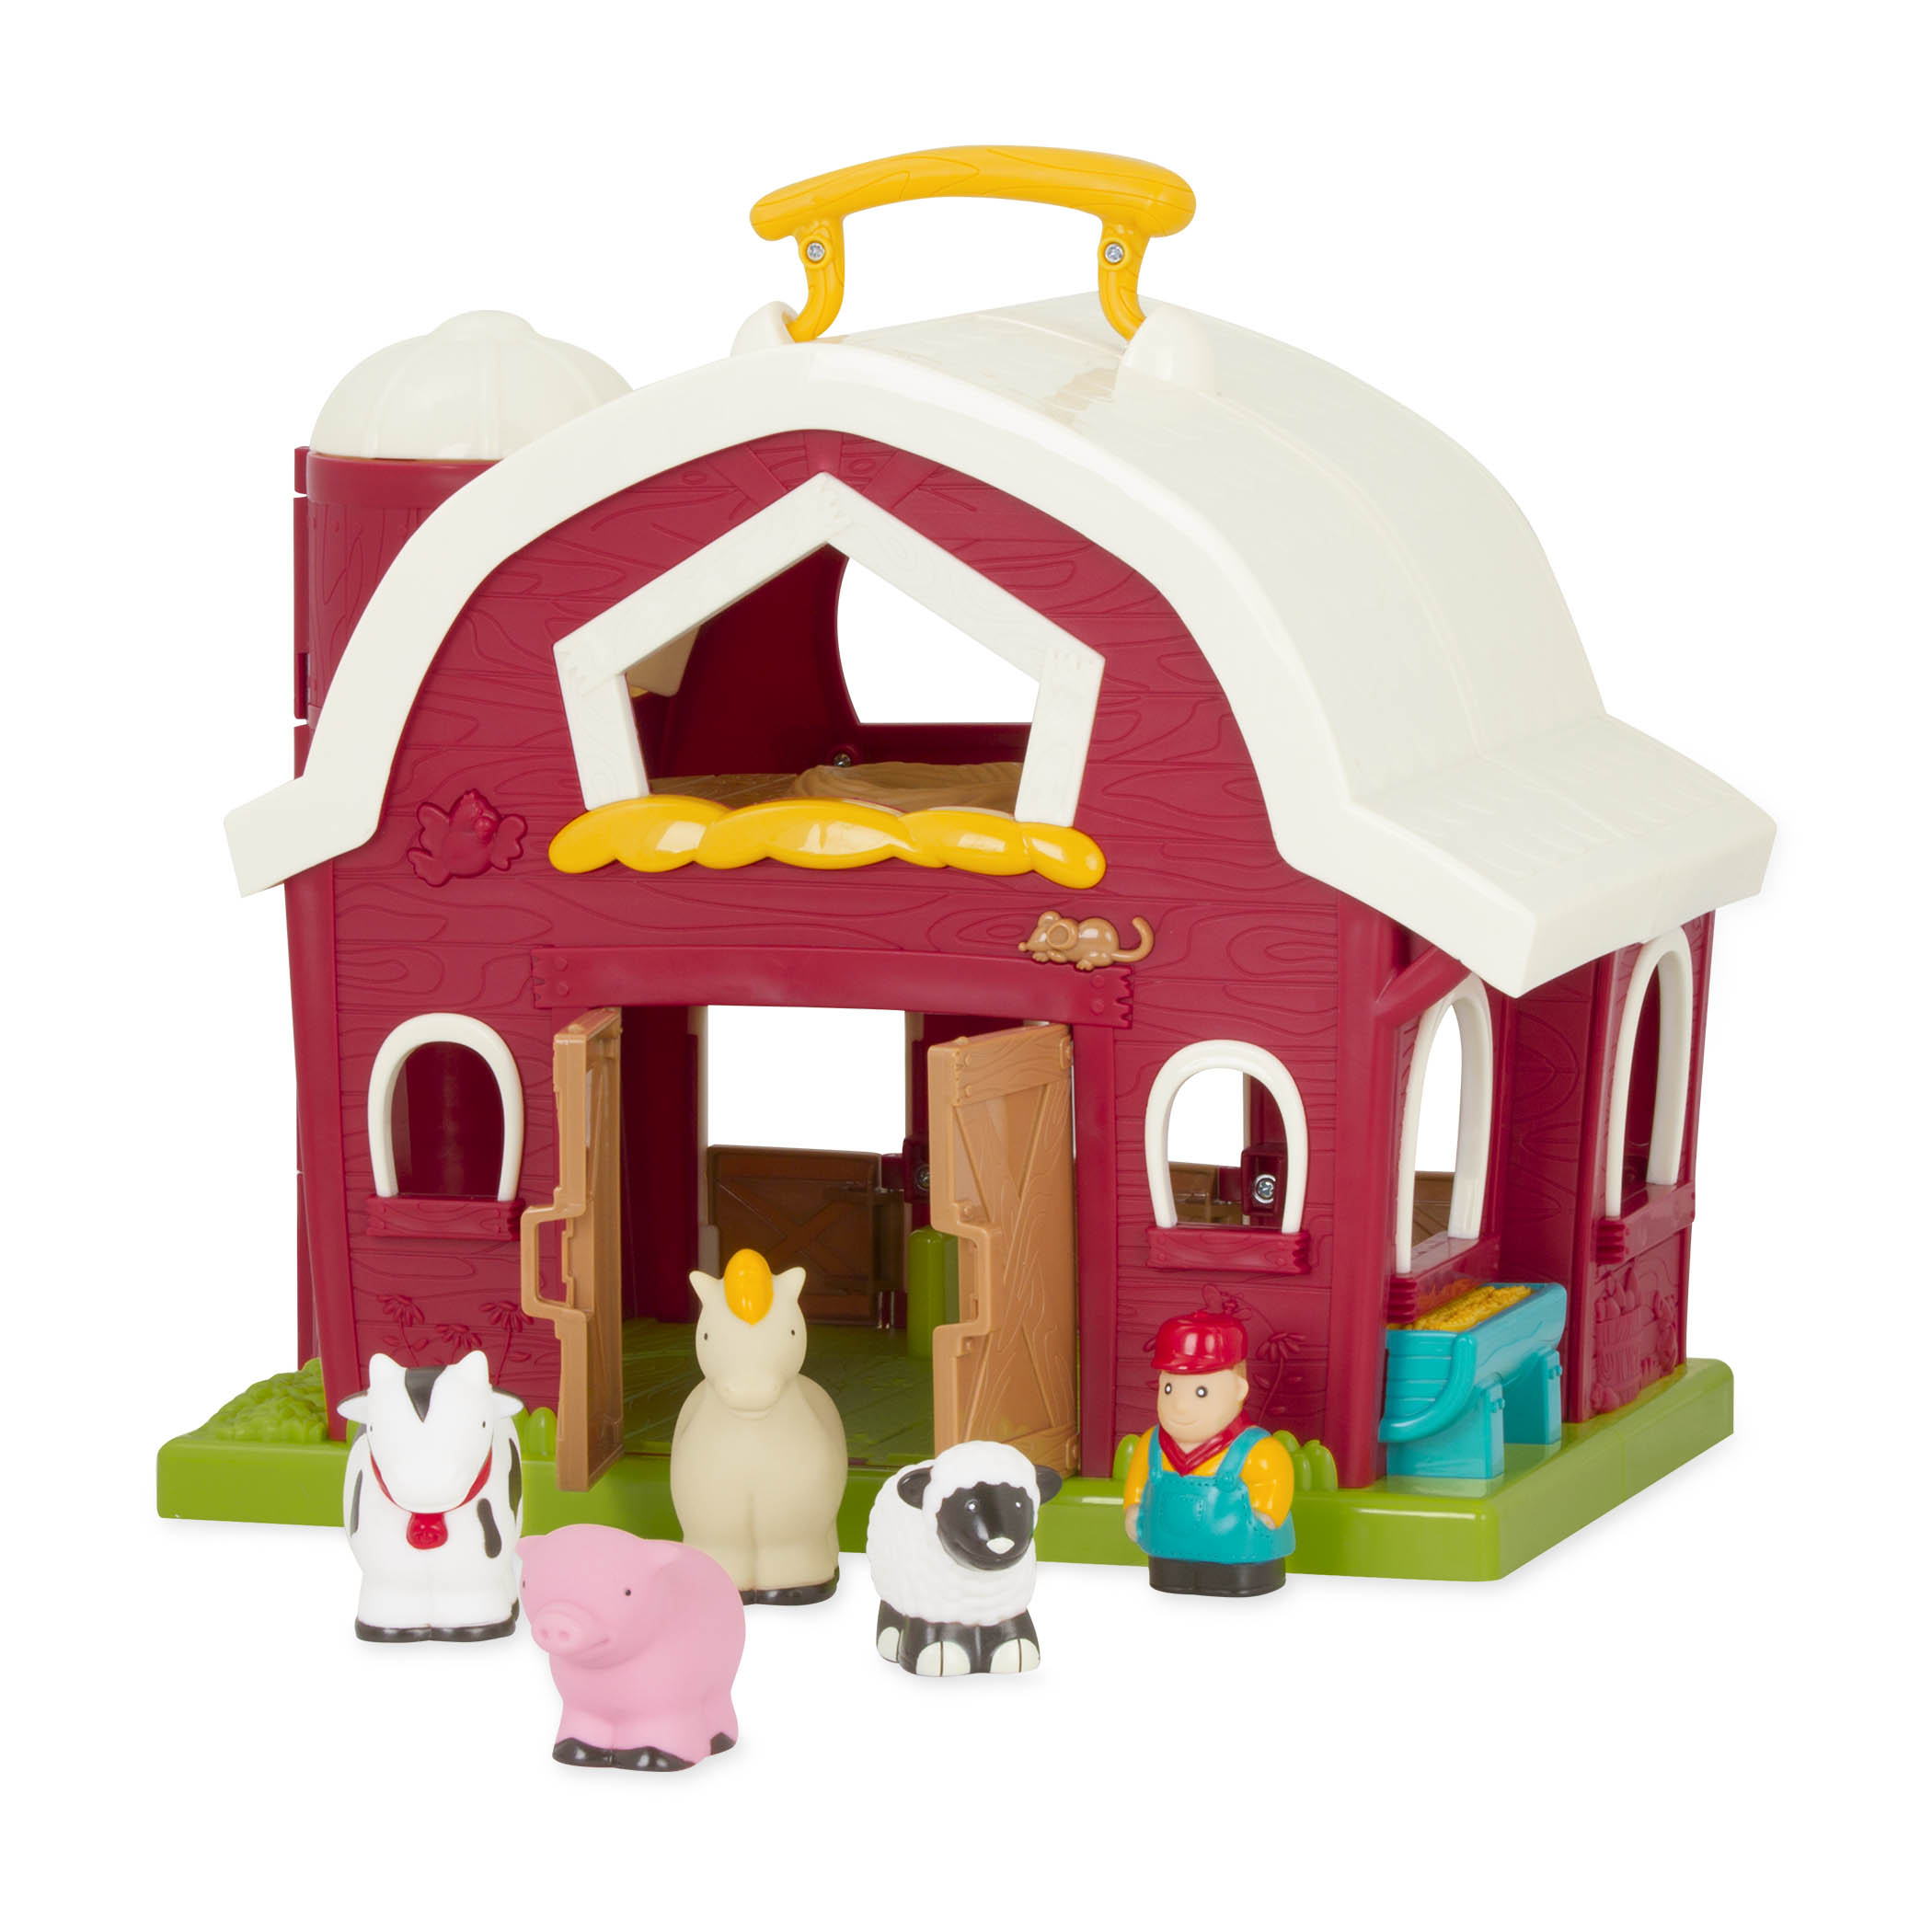 Animal Barn Toy | Farm Animal Set for Toddlers | Battat